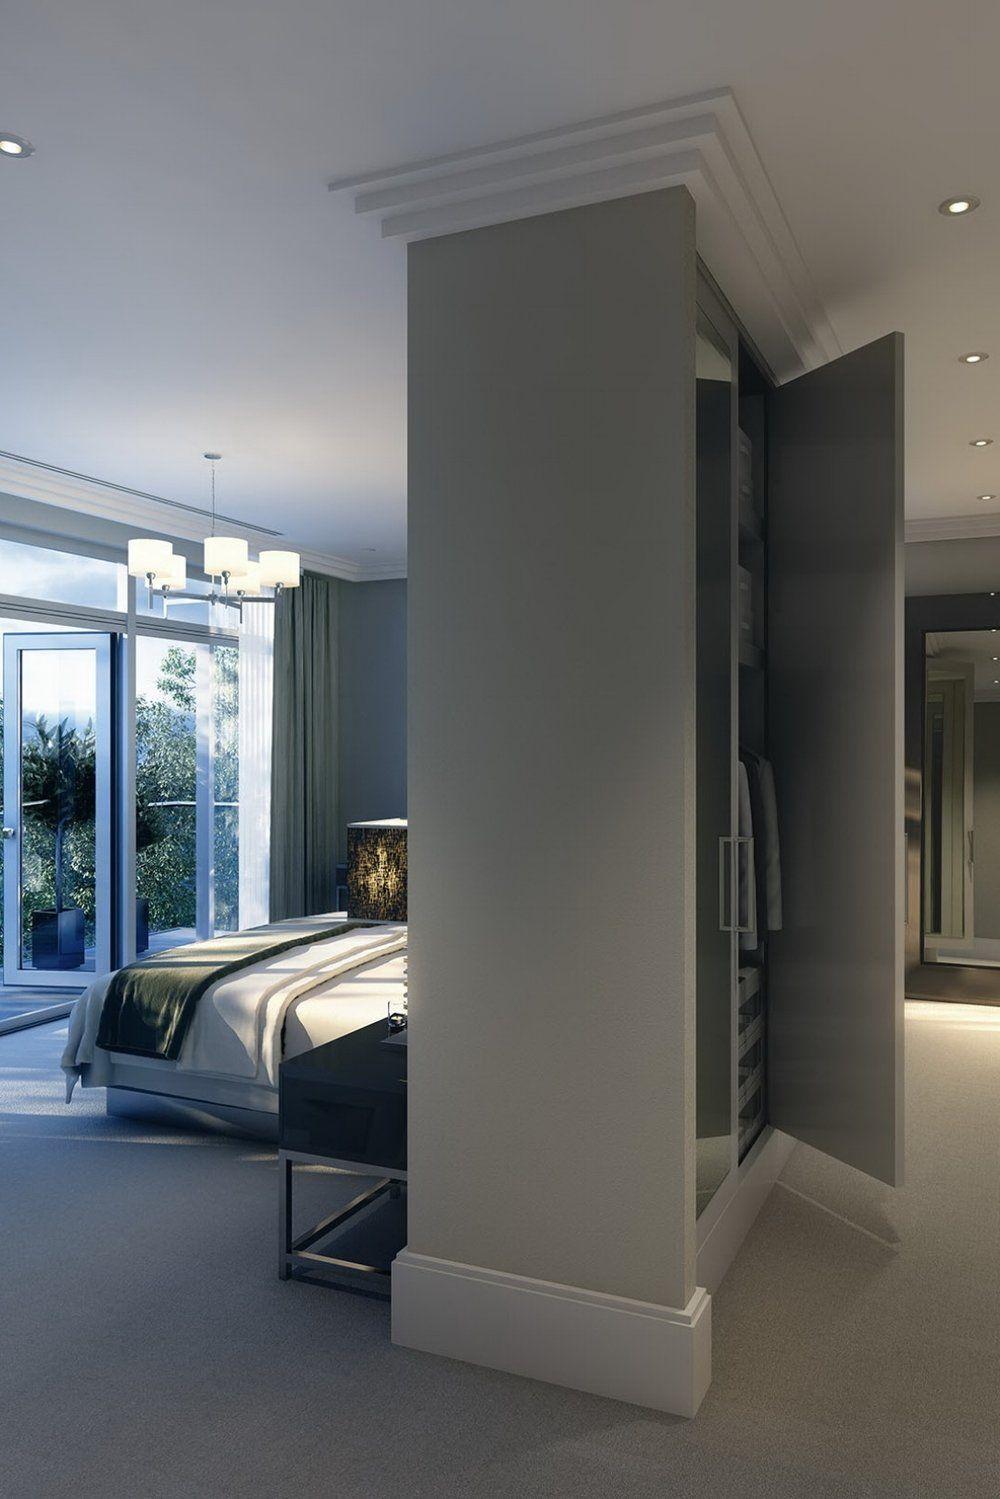 31 gorgeous ultra modern bedroom designs in 2018 house rh pinterest com